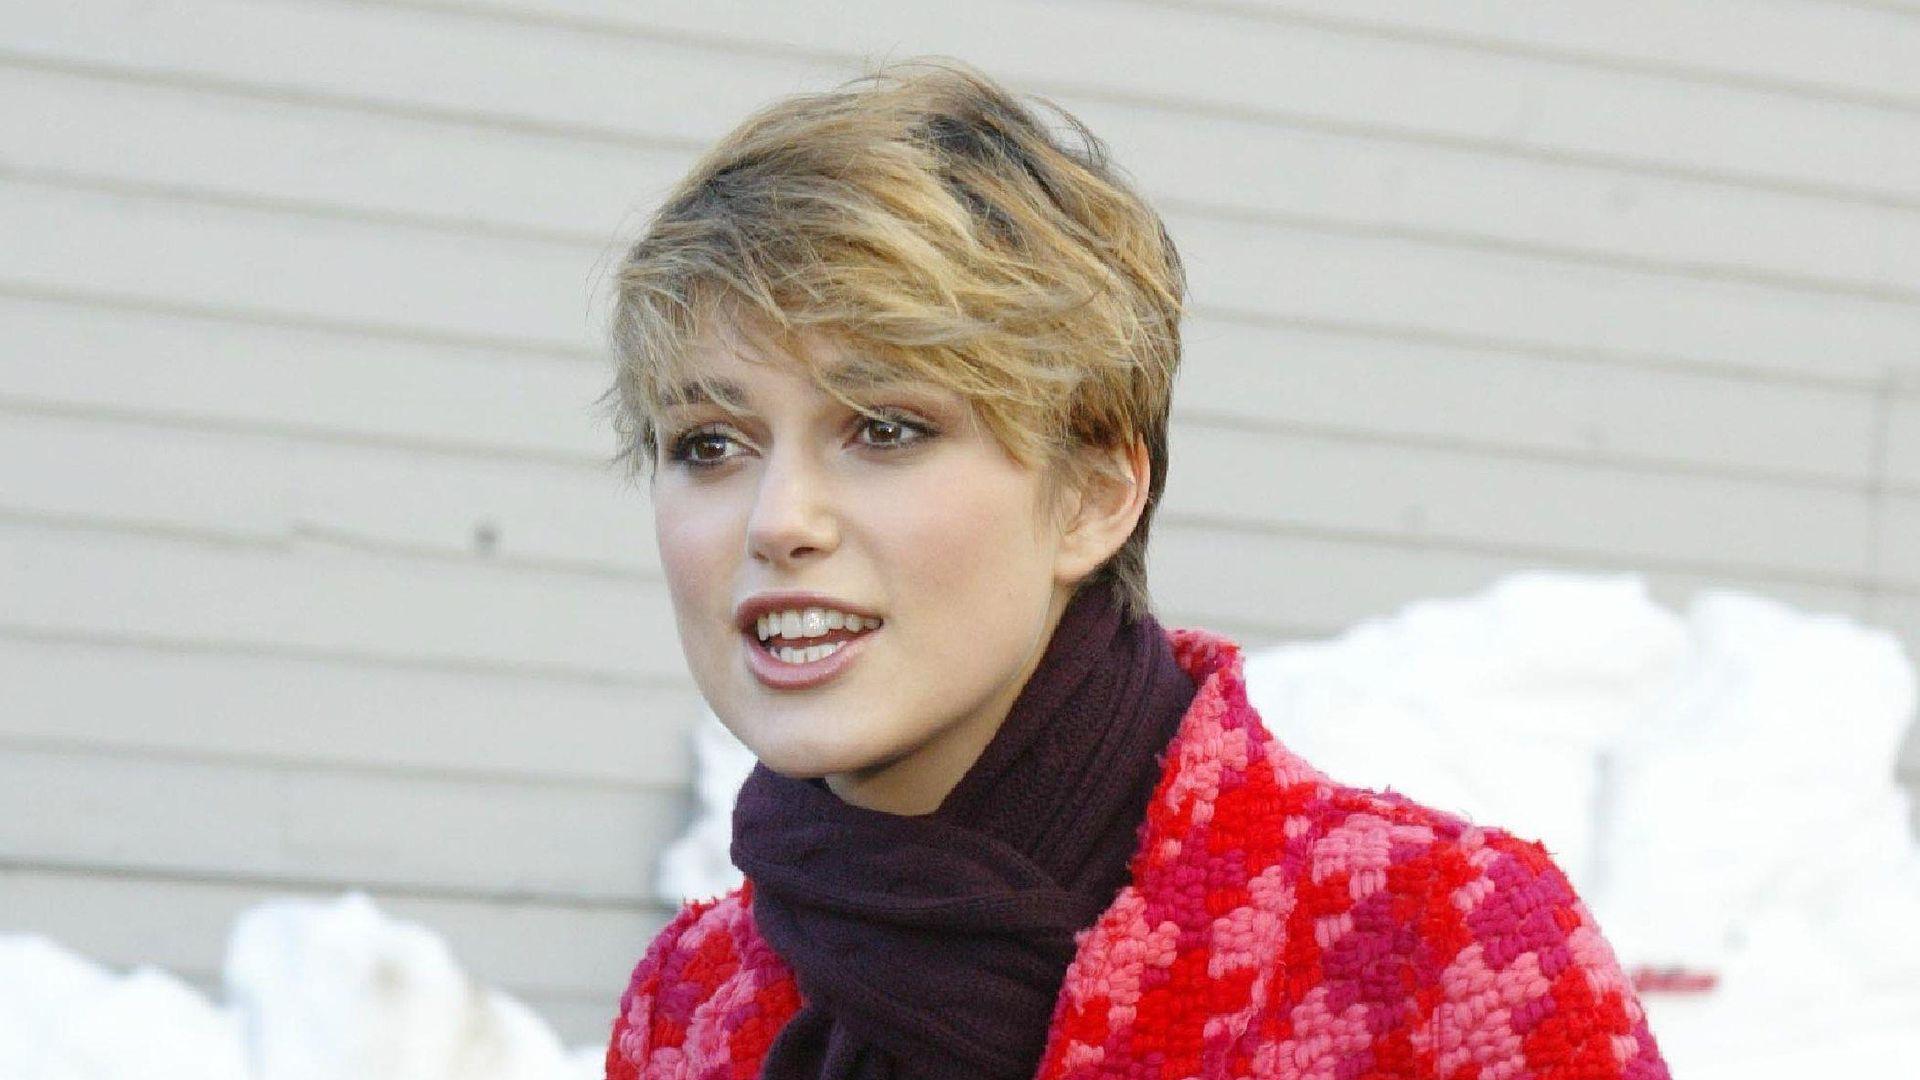 Haarausfall Keira Knightley Trug 5 Jahre Lang Nur Perücken